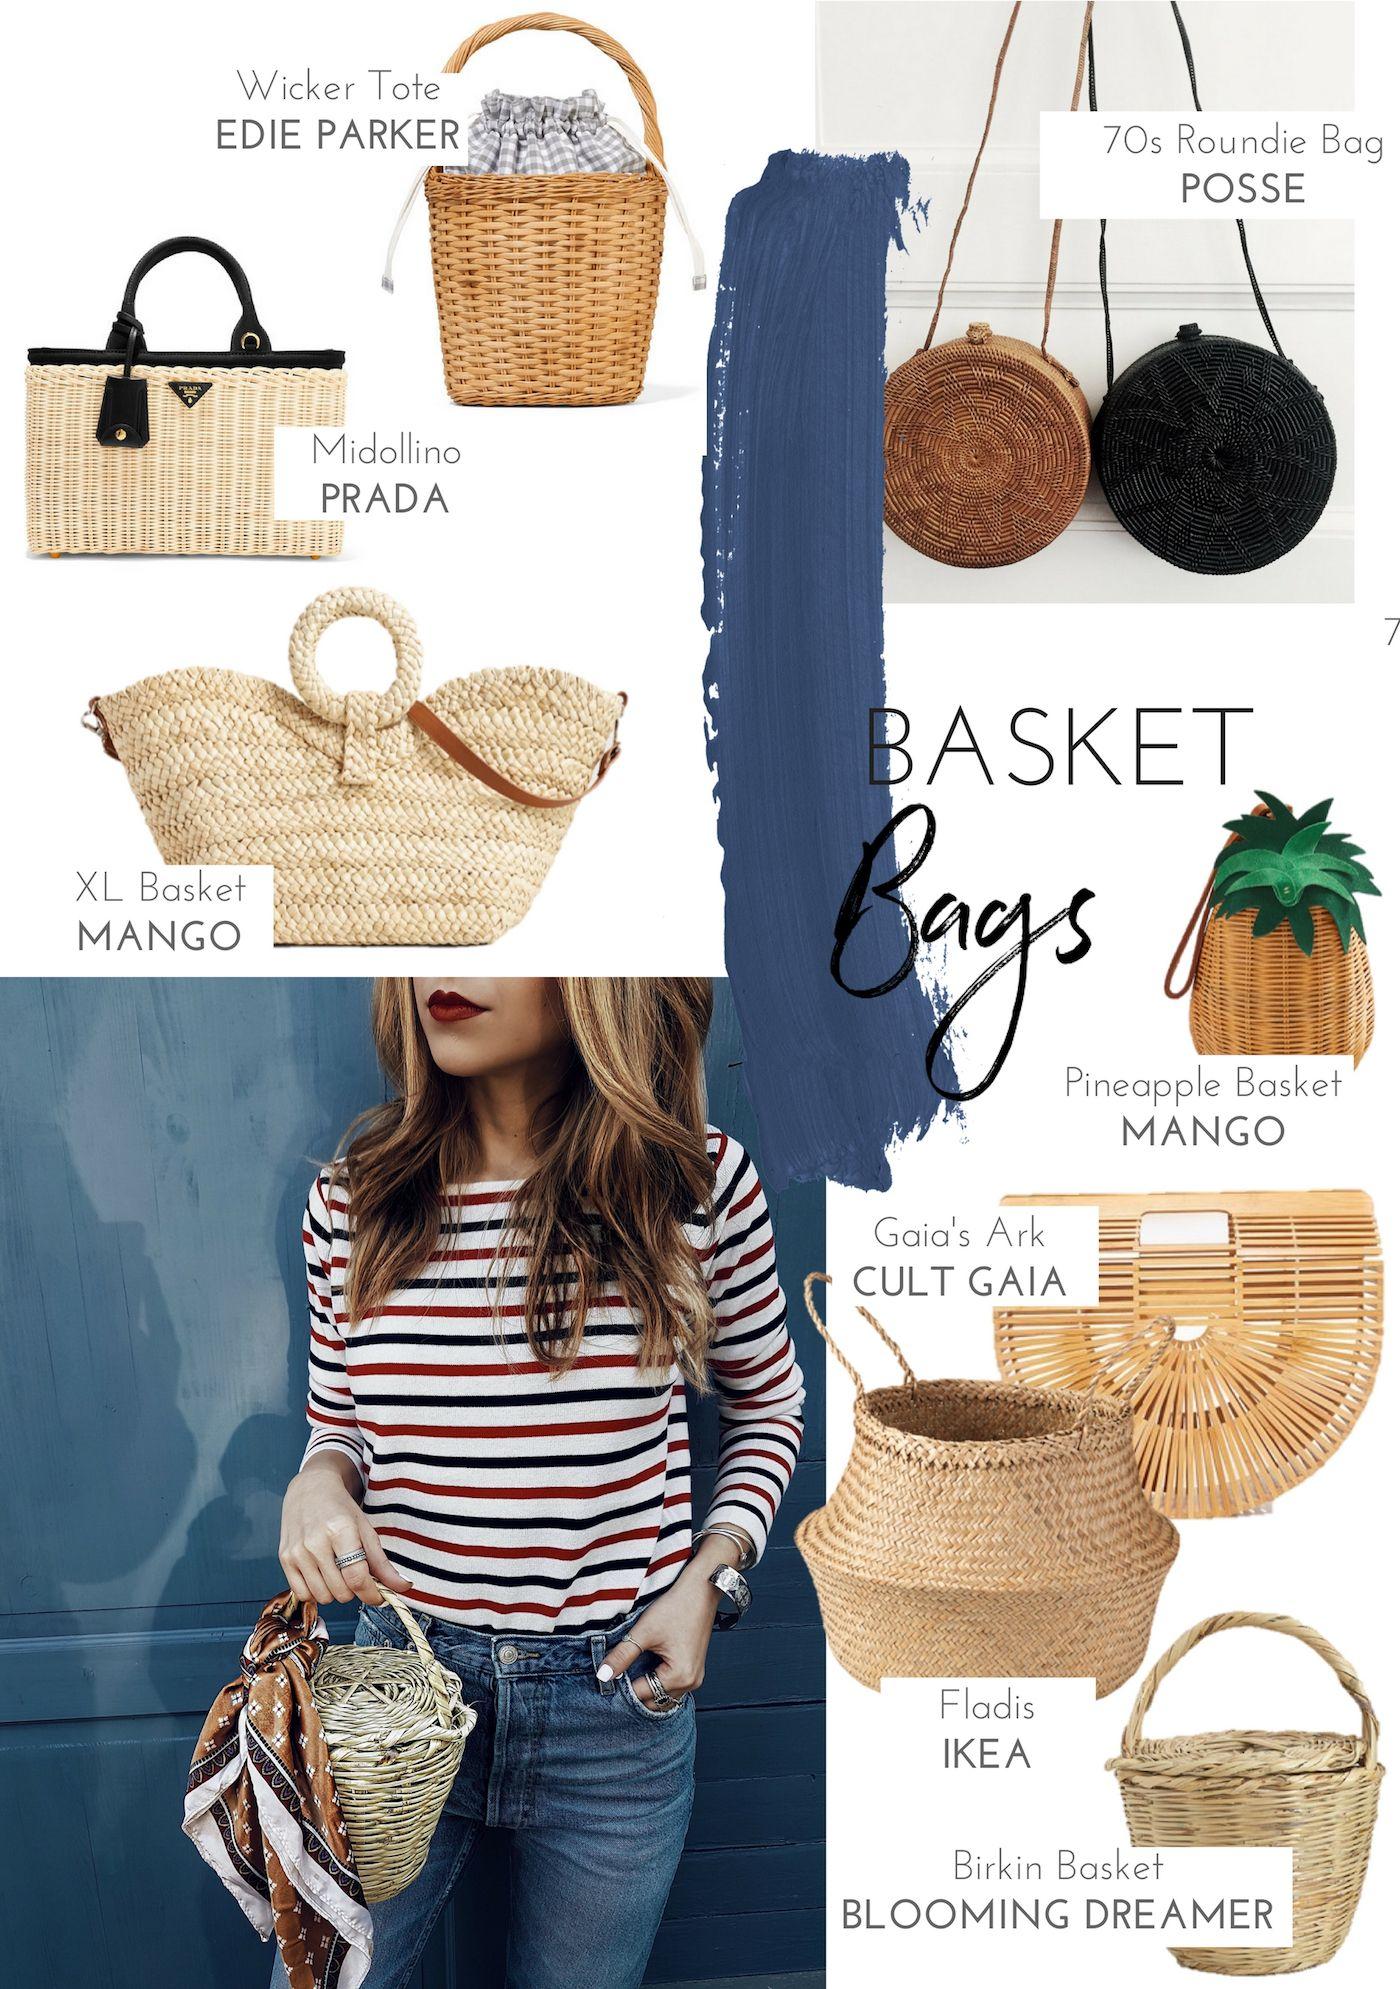 Straw Bag Round-Up | Shopping | Pinterest | Straw bag, Rounding ...